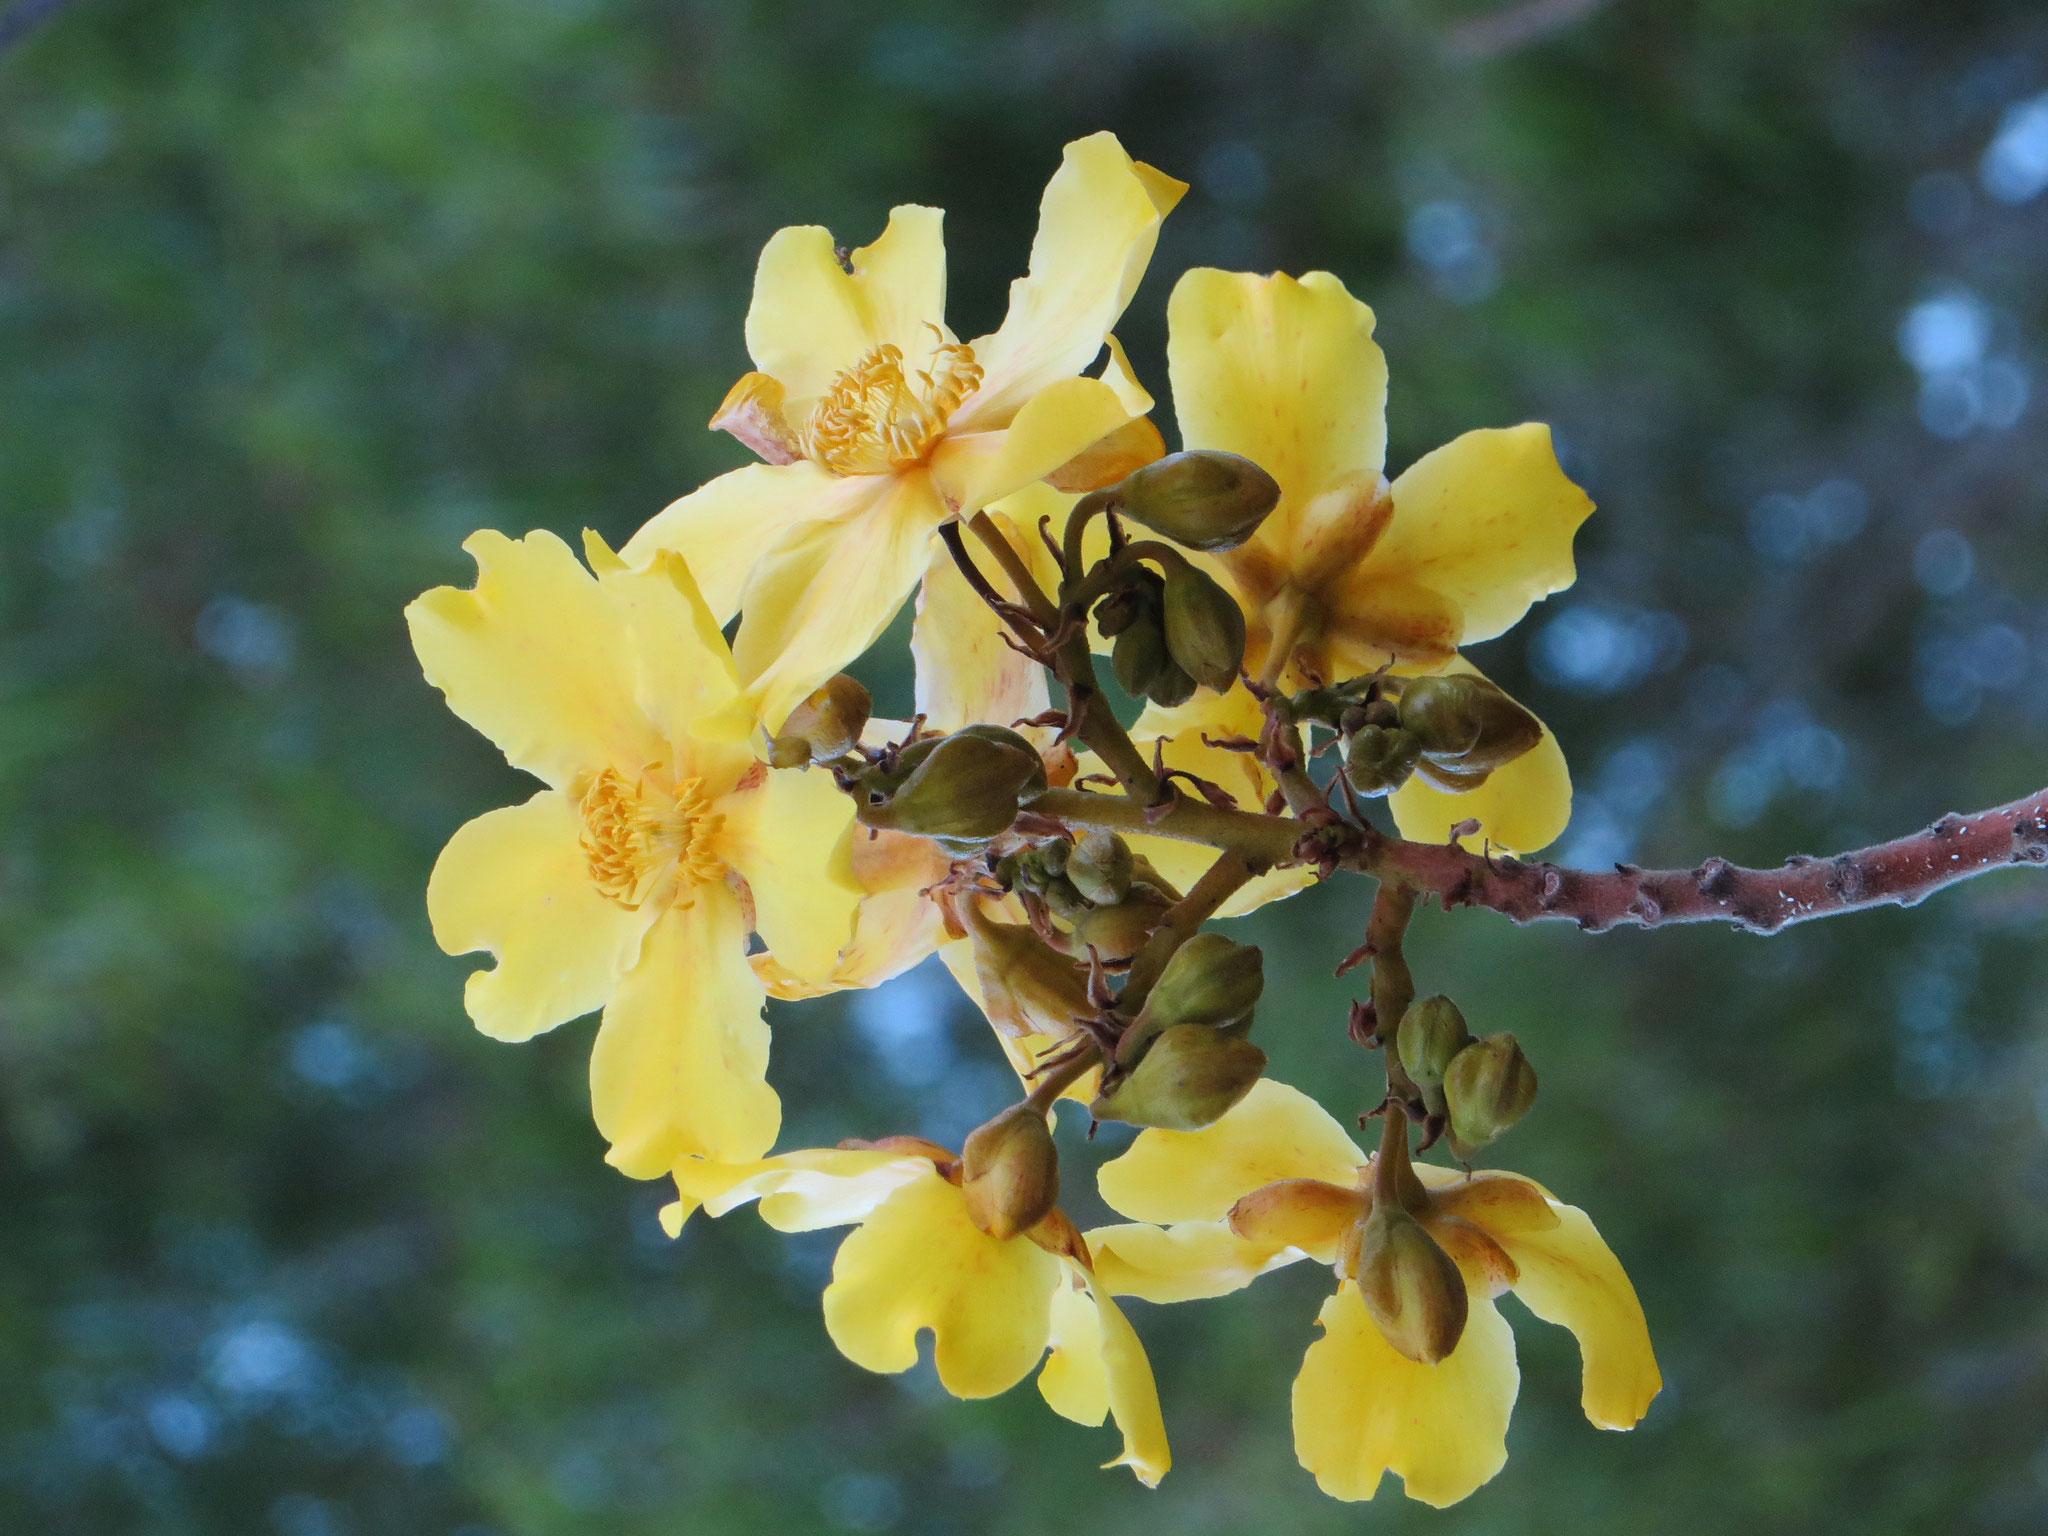 Kapok tree (Cochlospermum fraseri) flowers